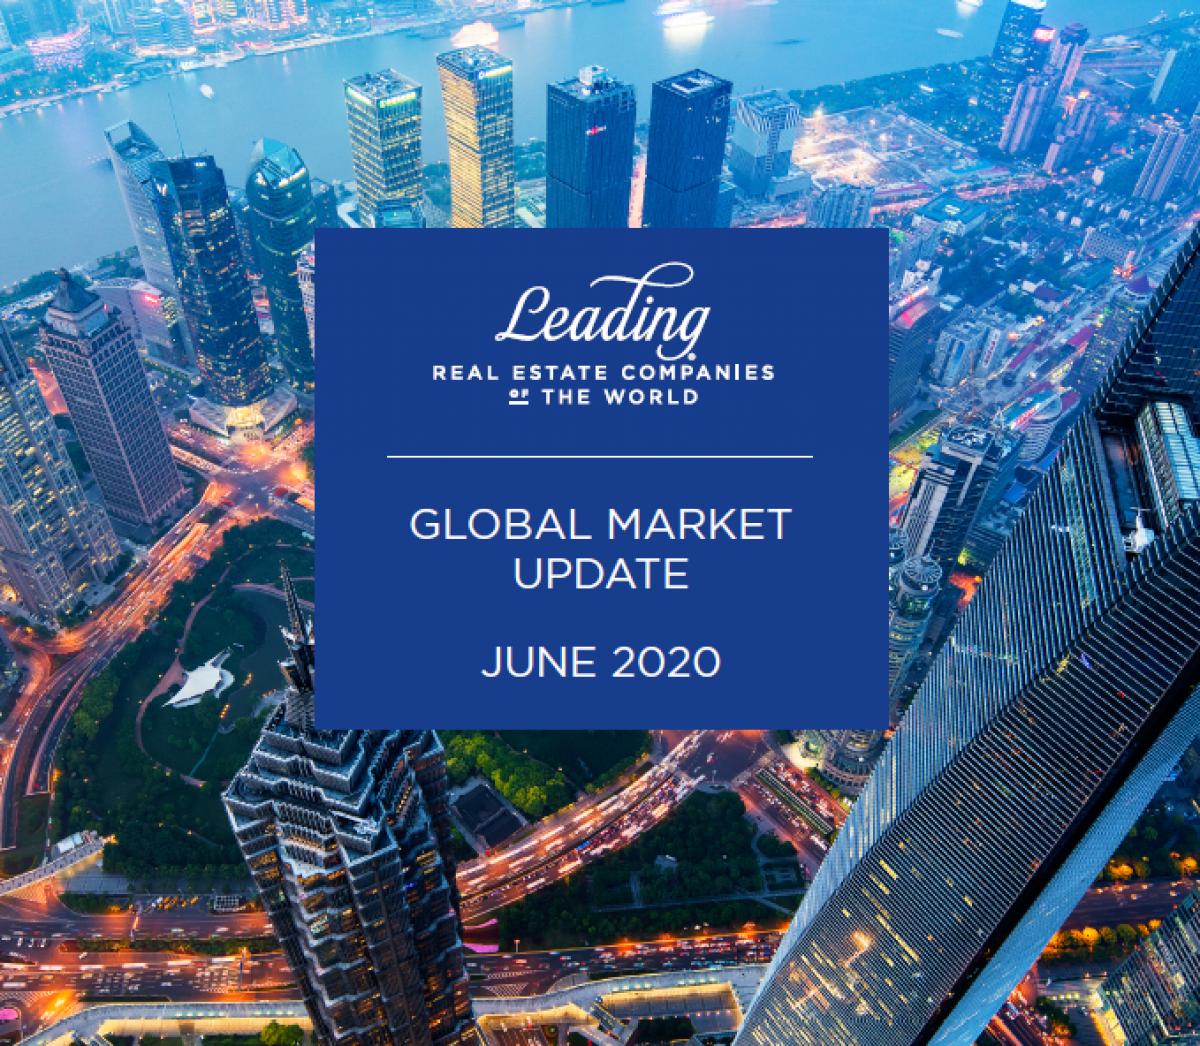 Global Market Update - Analysis of Leading RE, June 2020